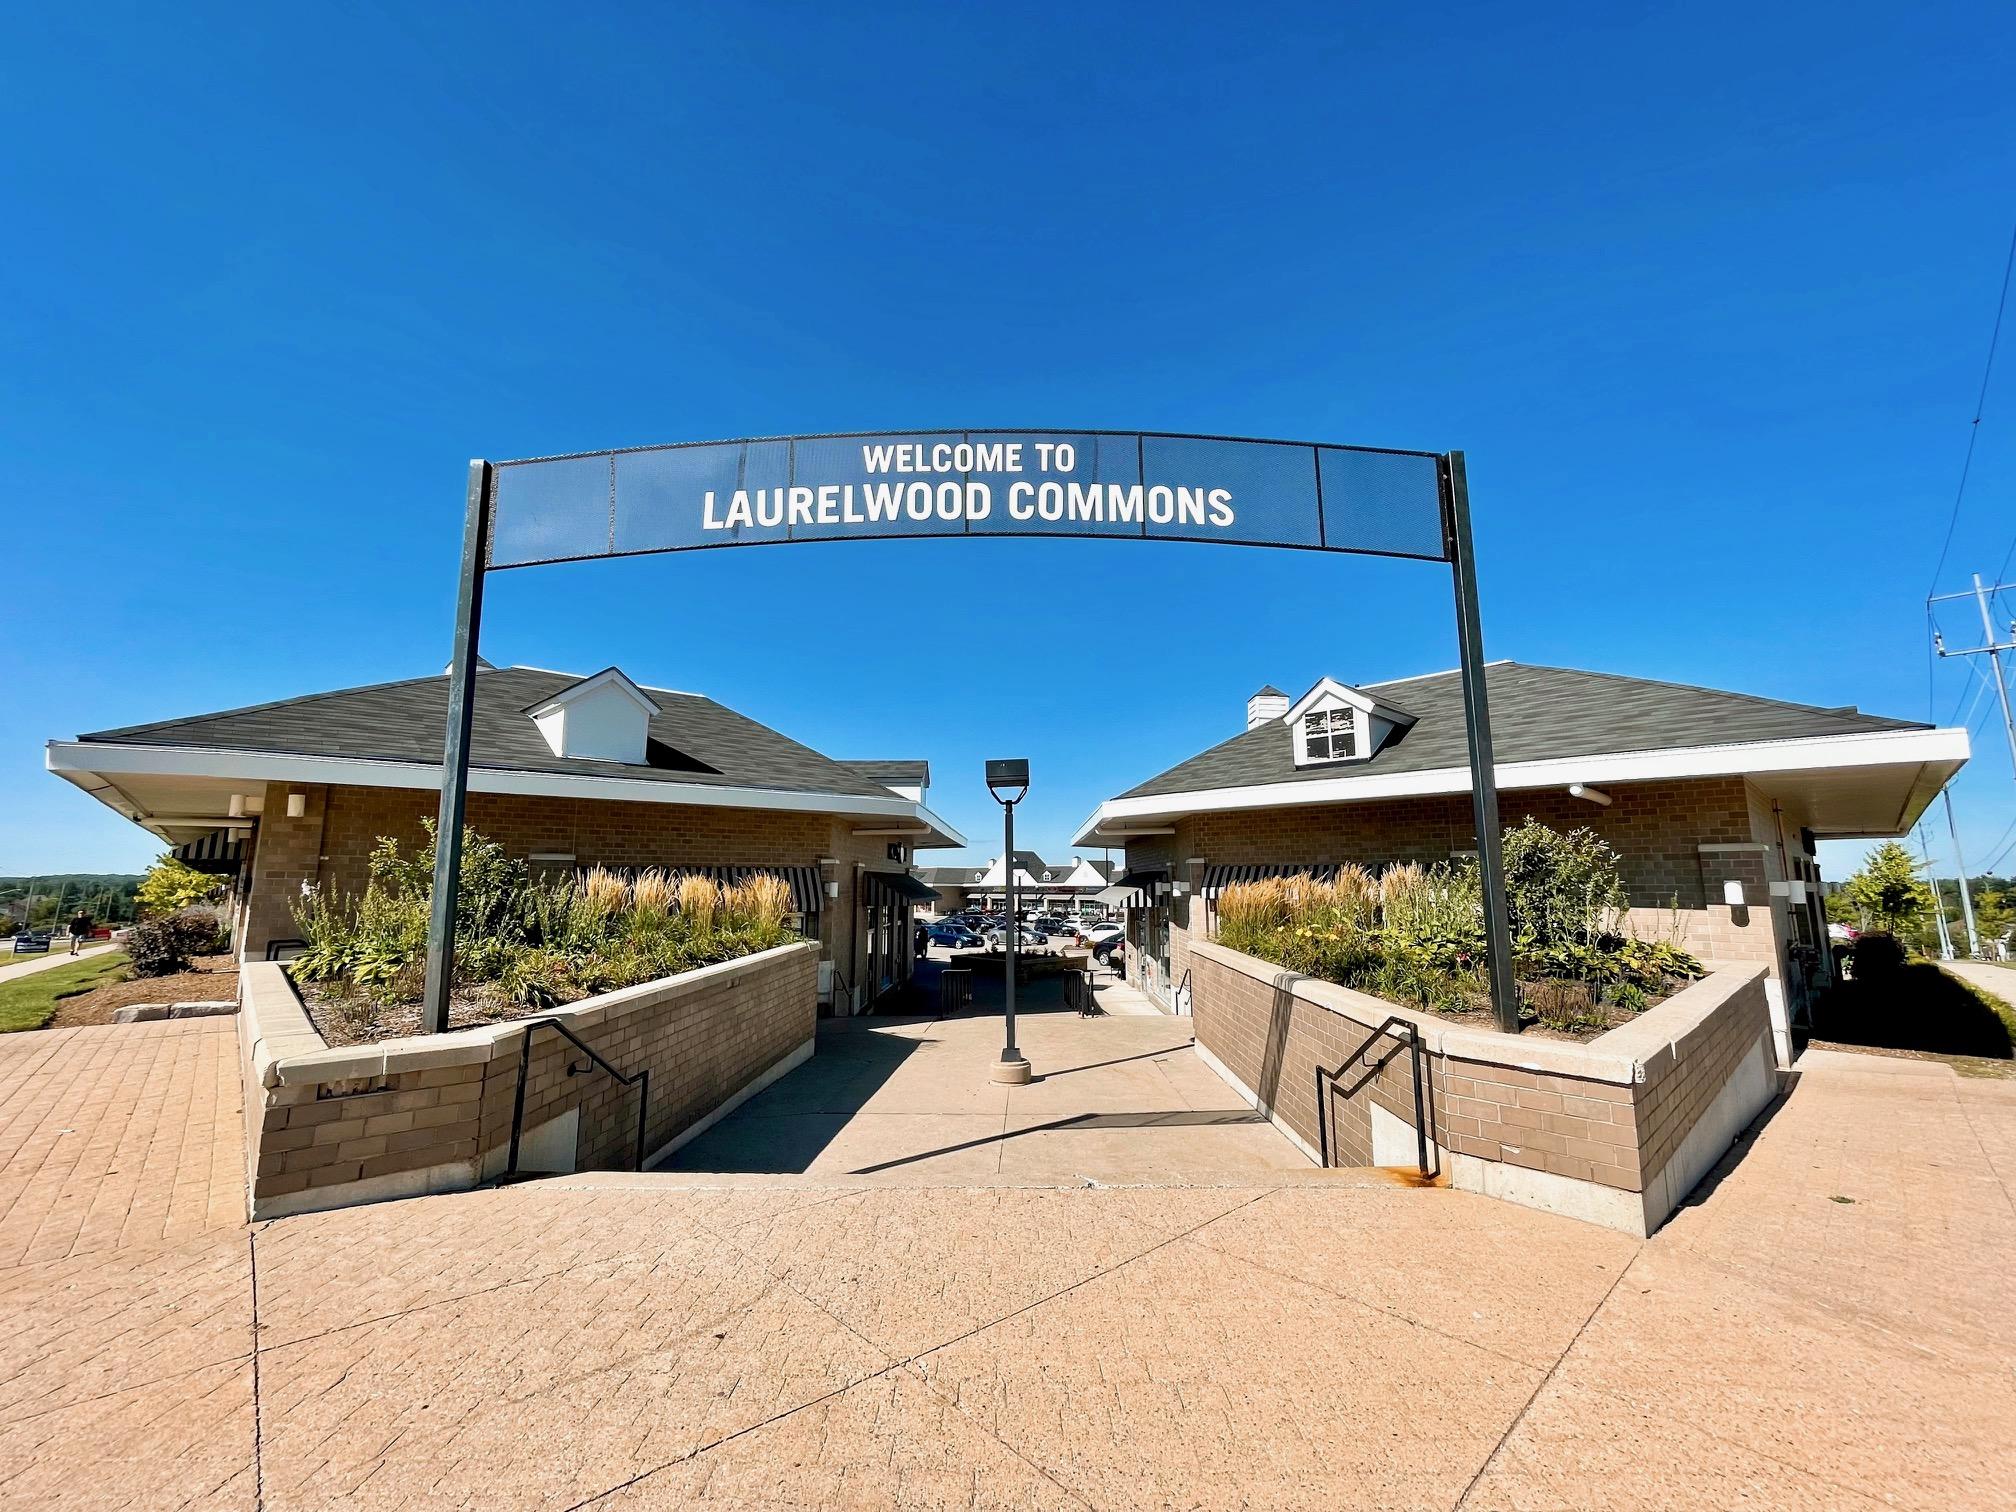 600 Laurelwood Dr (Unit 320), Waterloo   Laurelwood Common Unit for Lease